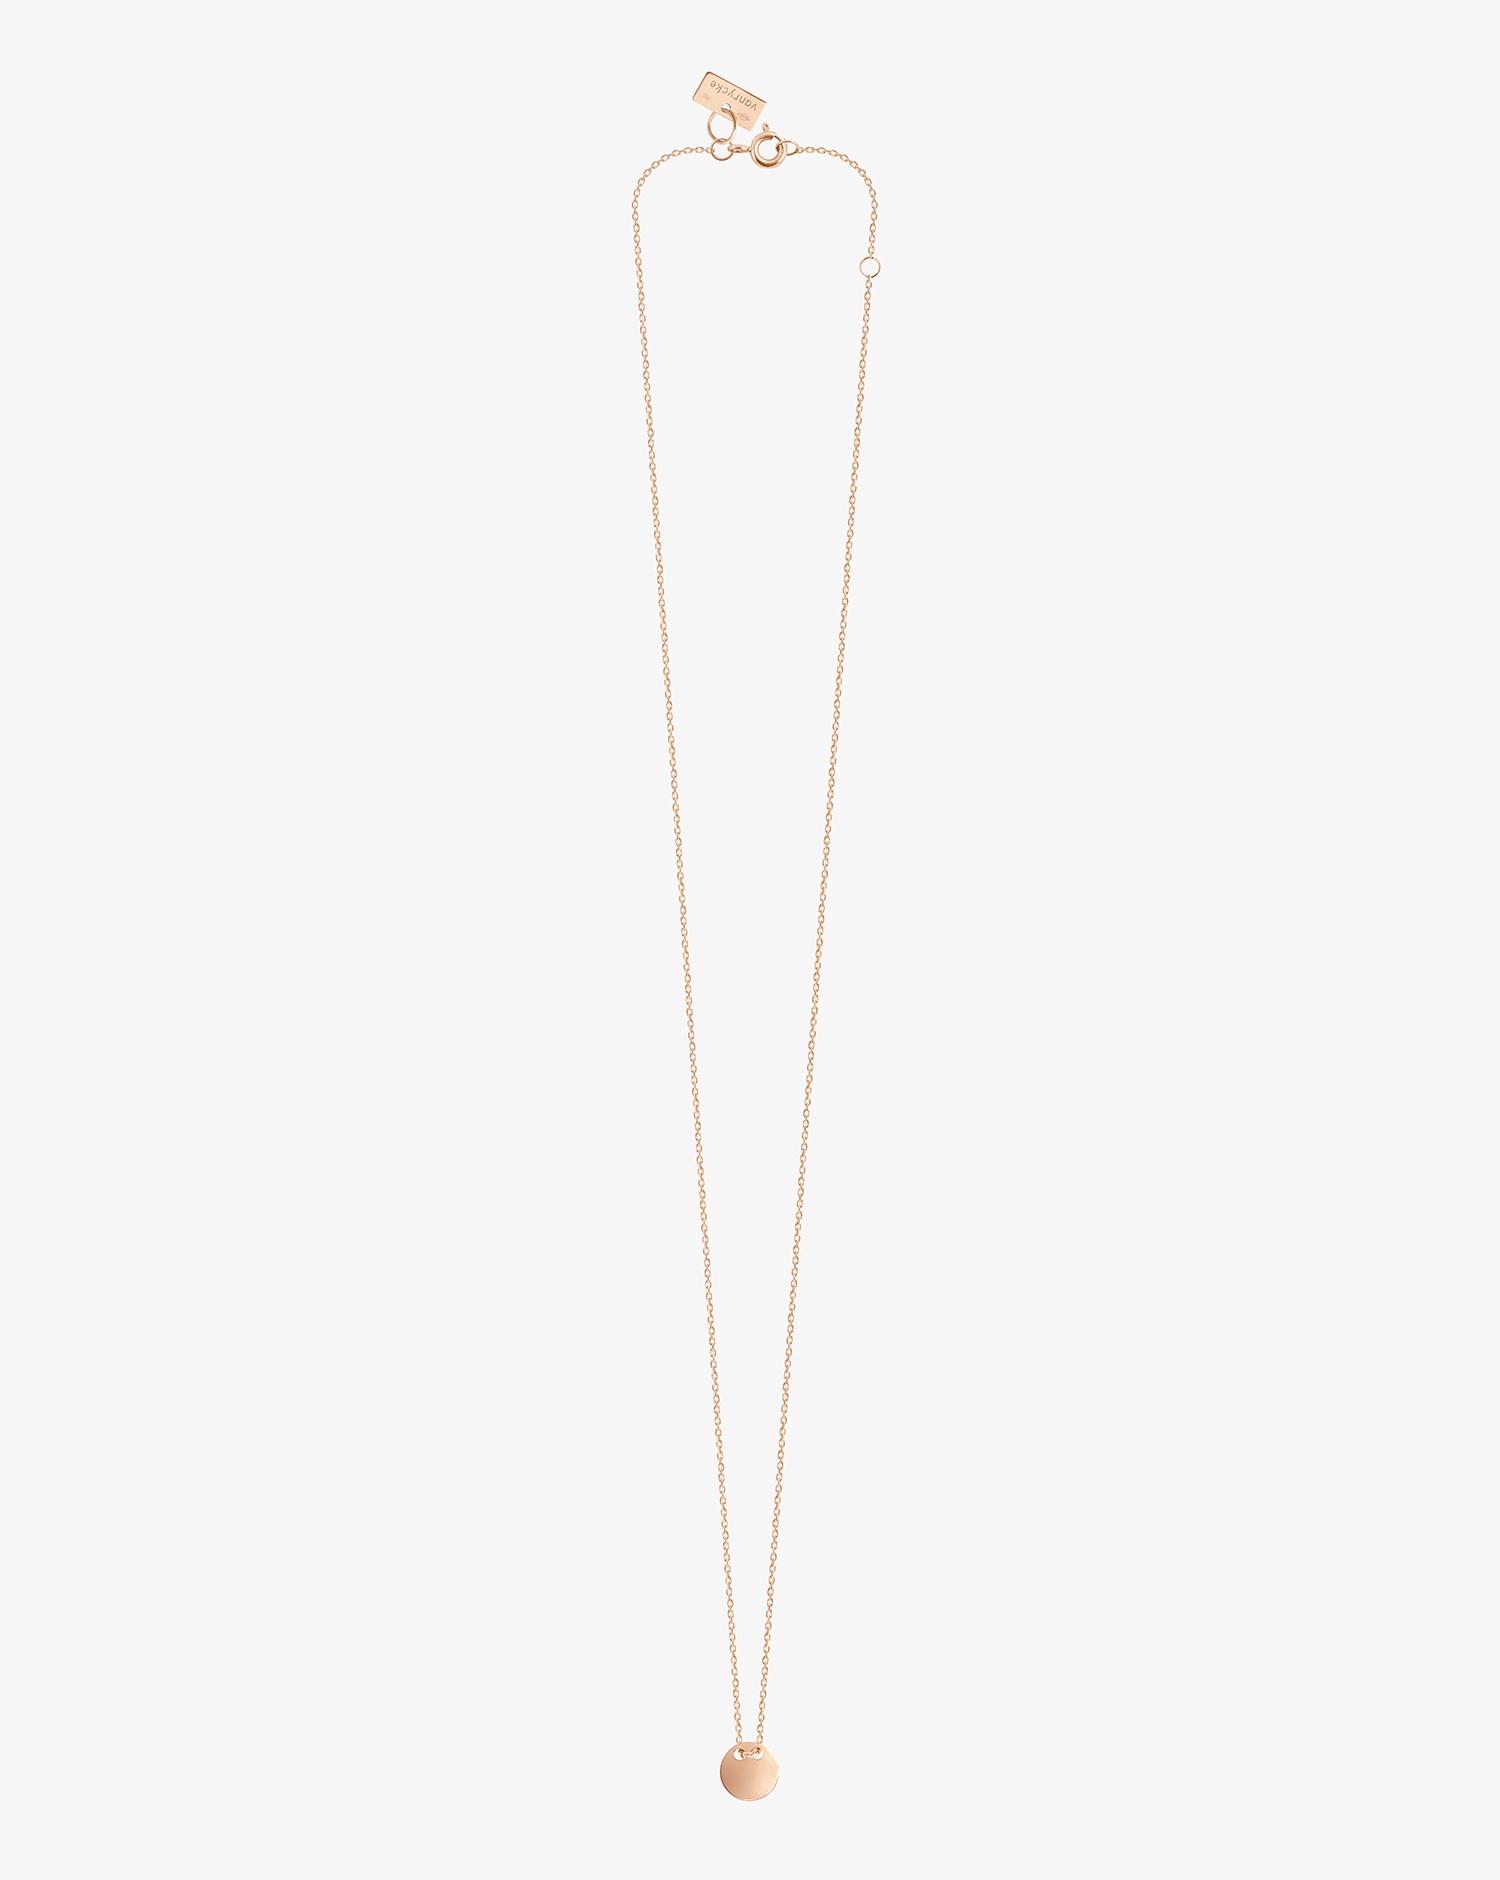 Kette Arizona Dream 18ct Gold - vanrycke - CA3R0-01